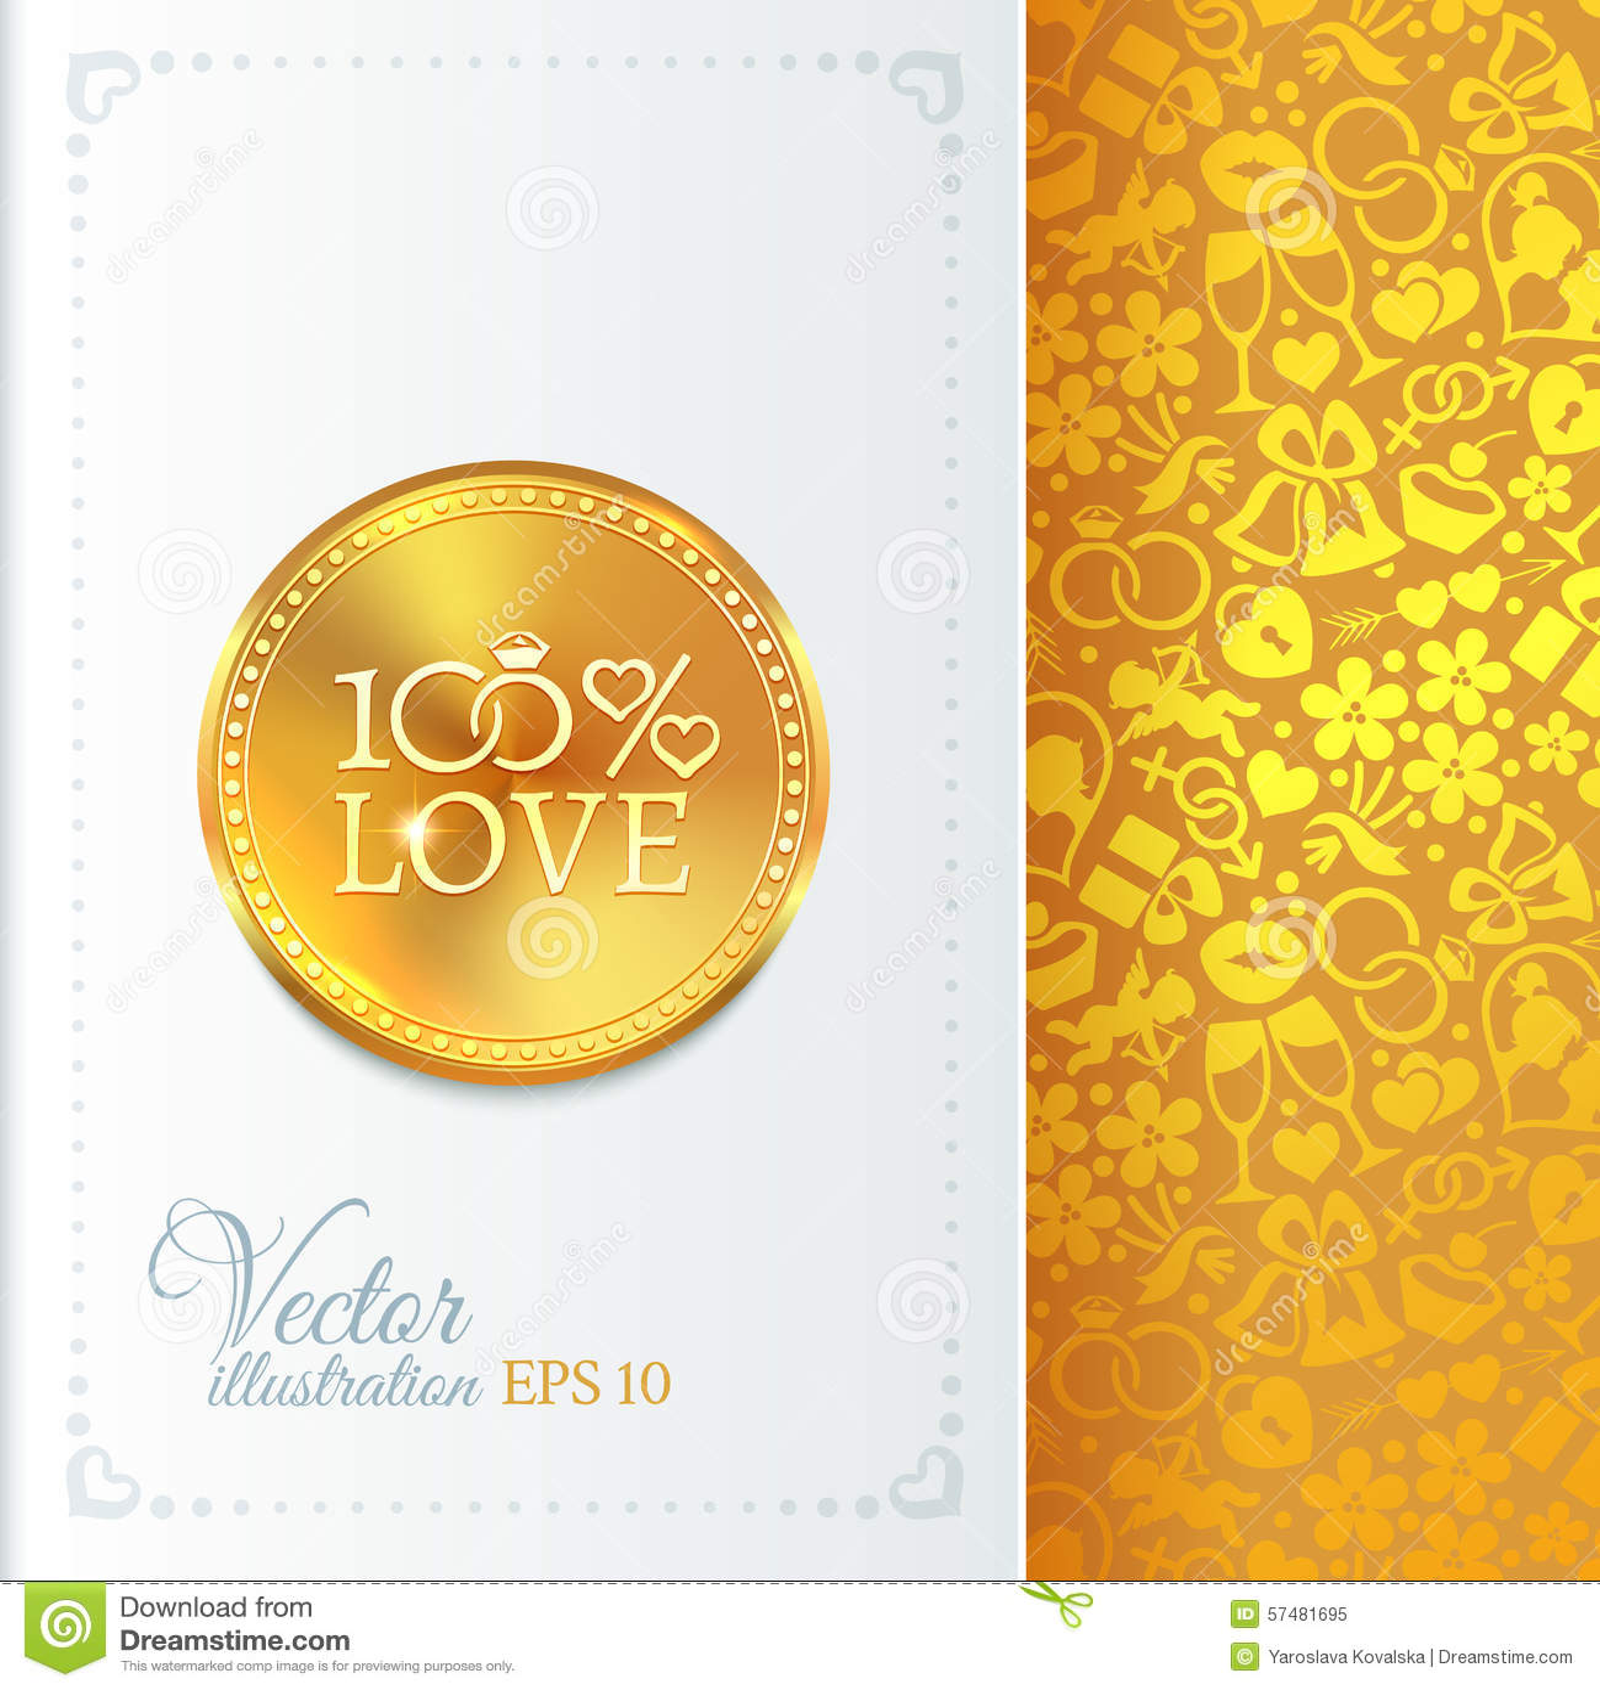 Classic Wedding Vintage Badge Stock Vector - Image: 57481695